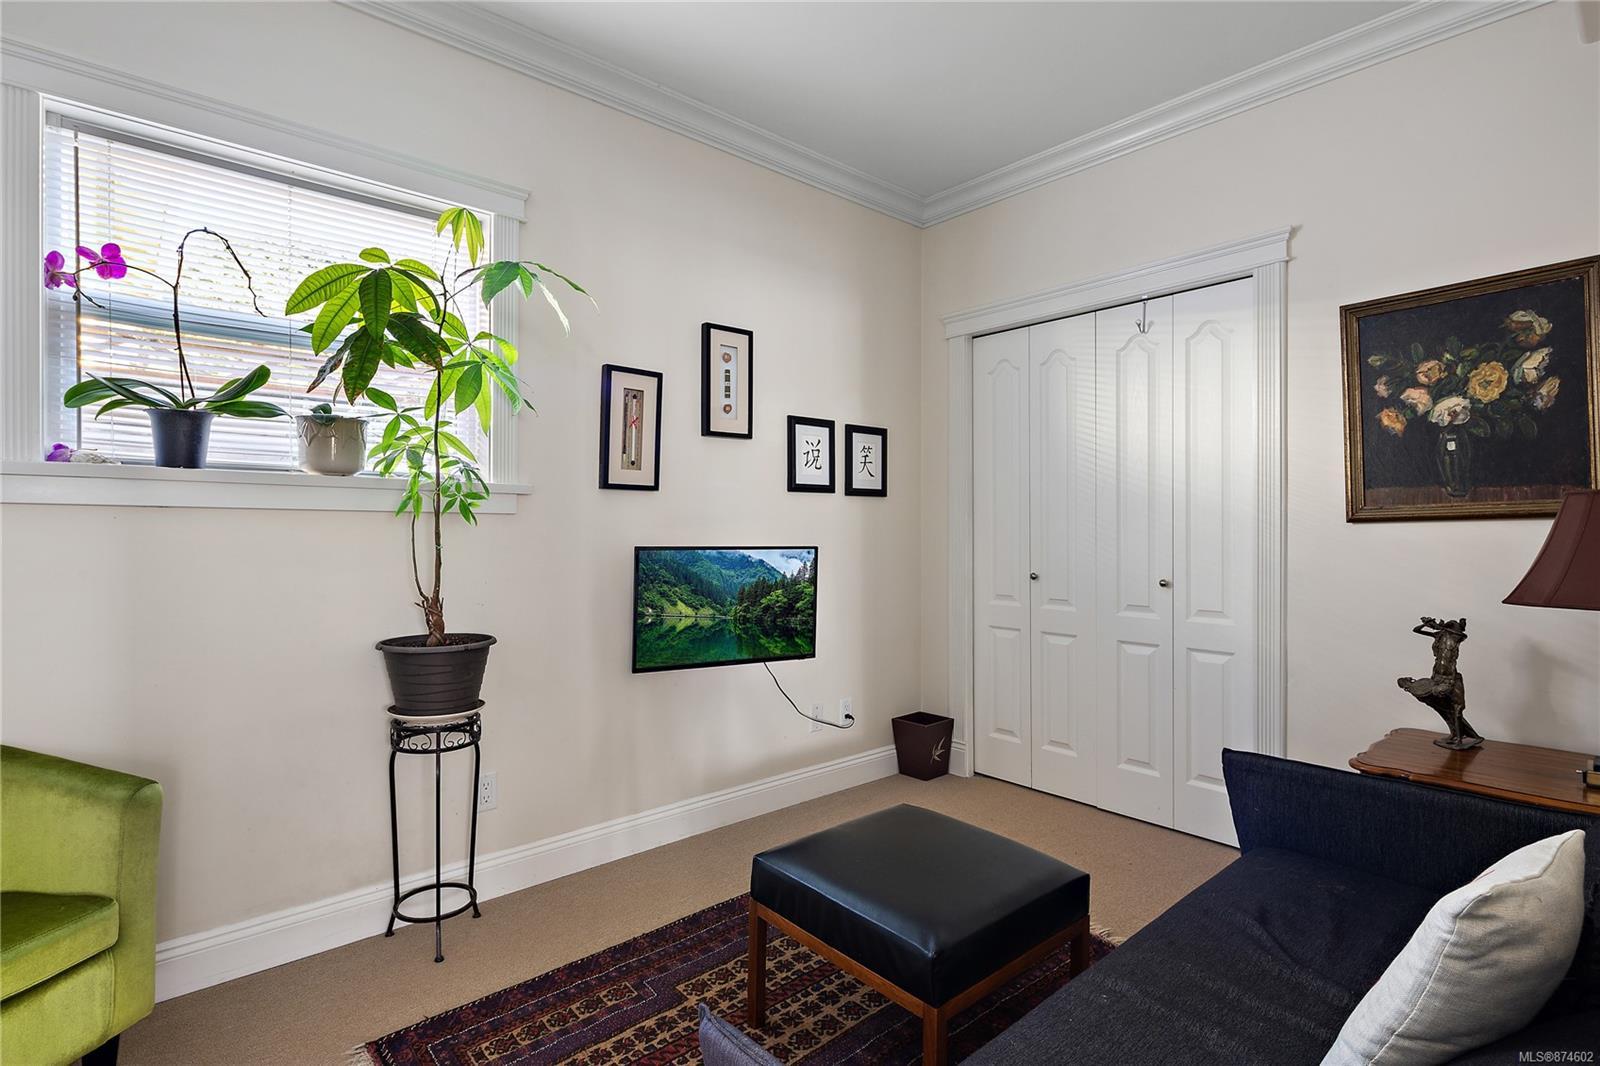 Photo 17 at 1 - 1376 Pandora Avenue, Fernwood, Victoria